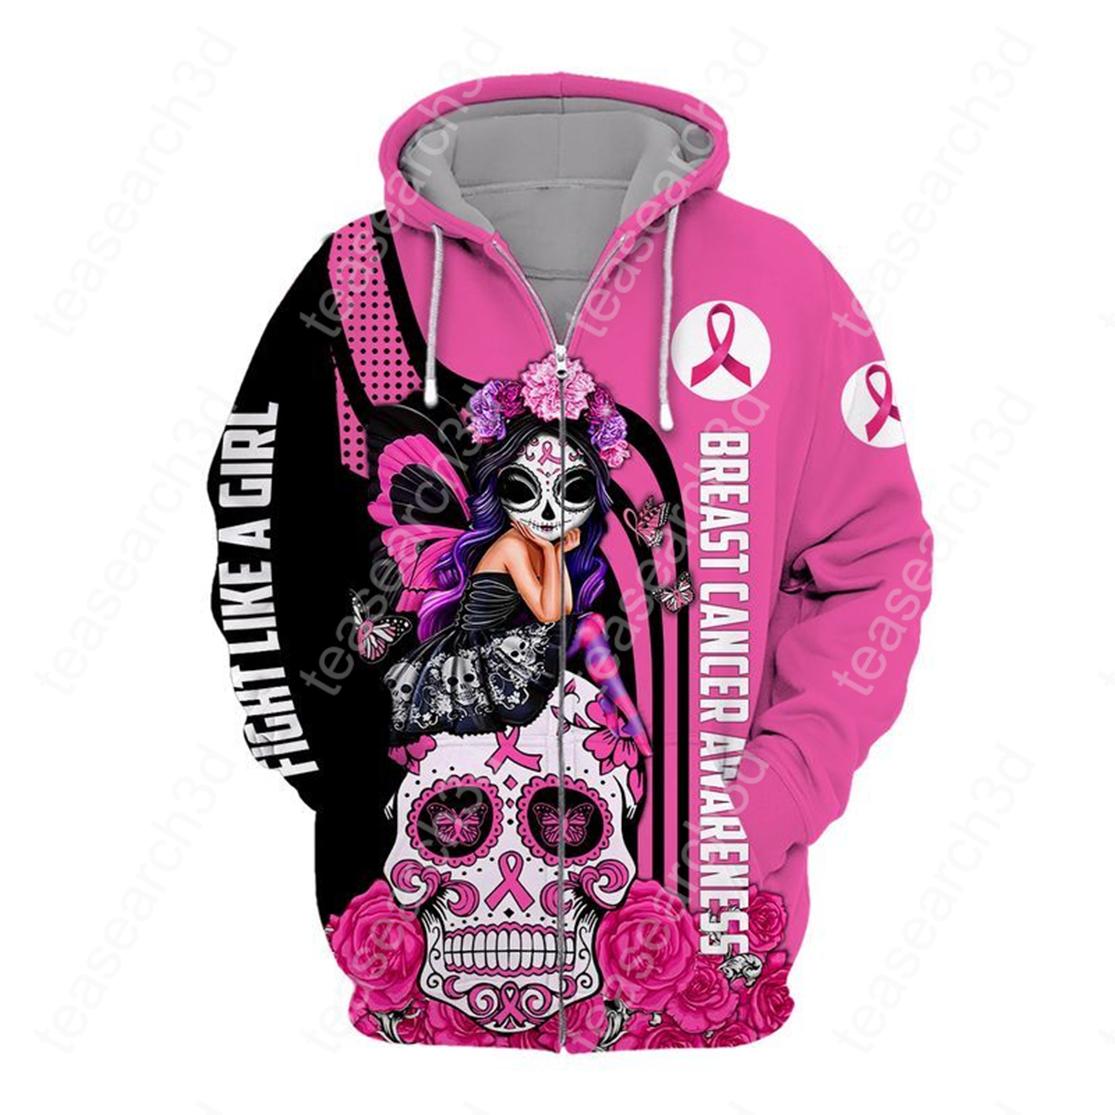 Skull fairy girl breast cancer awareness 3d zip hoodie